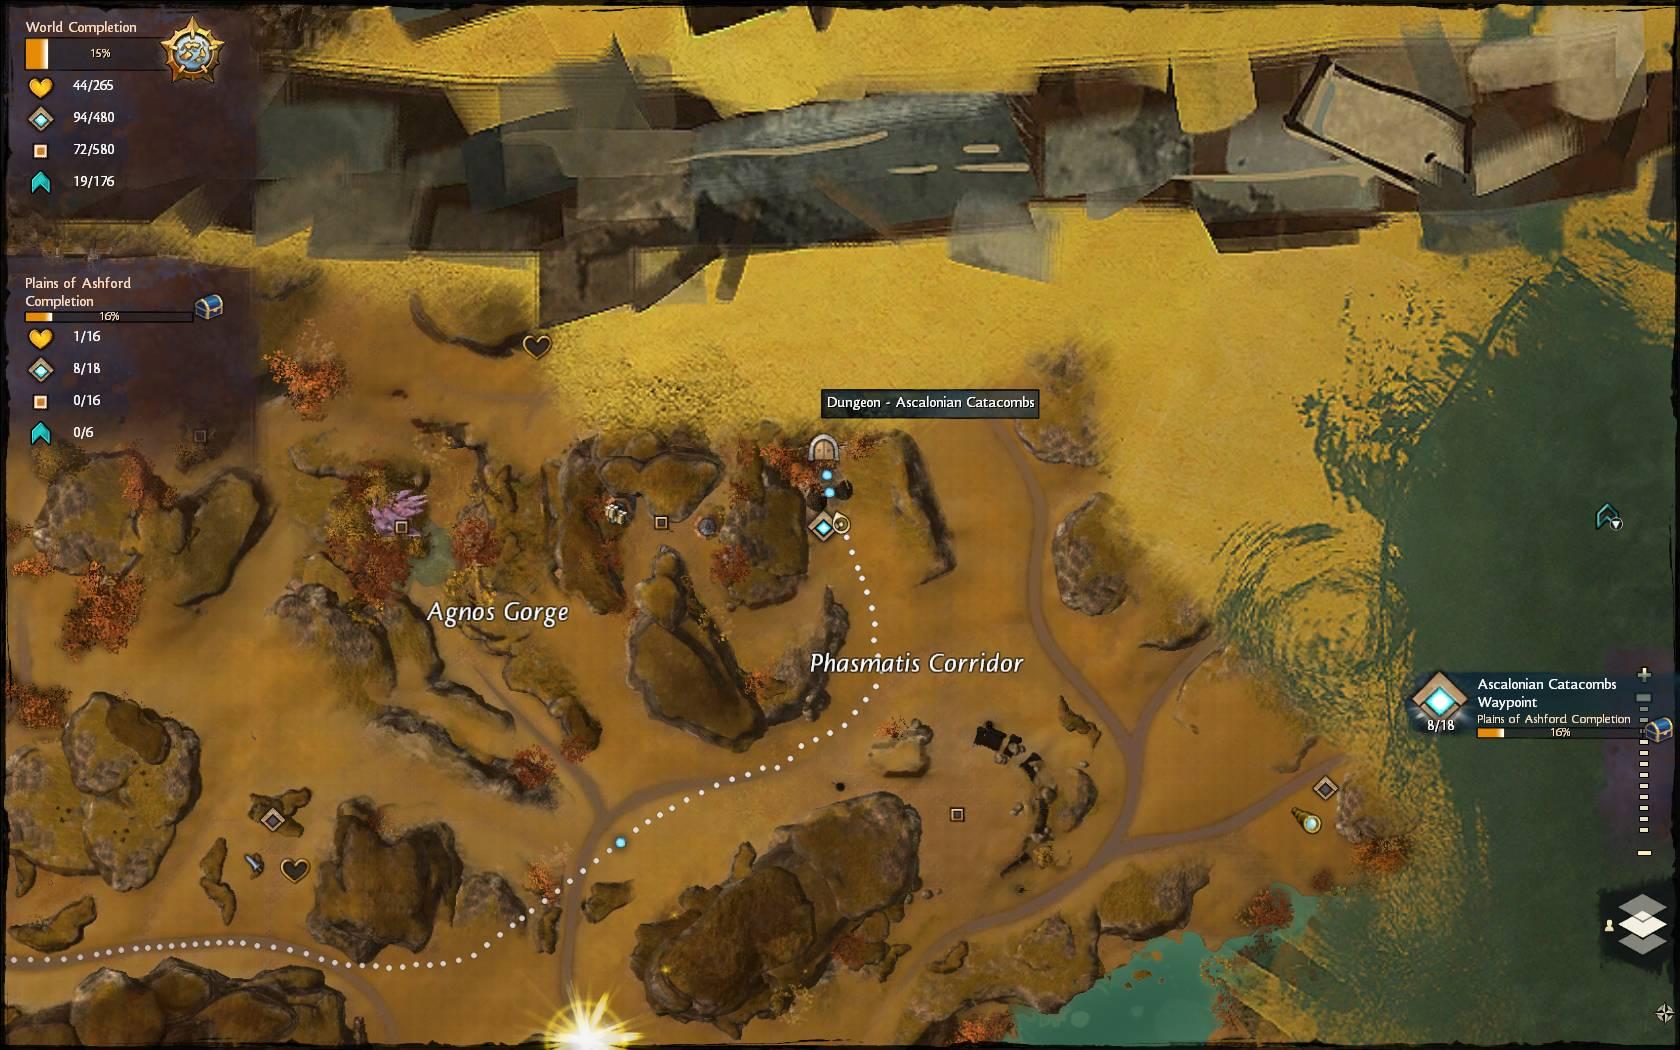 ascalon_catacombs_gw2